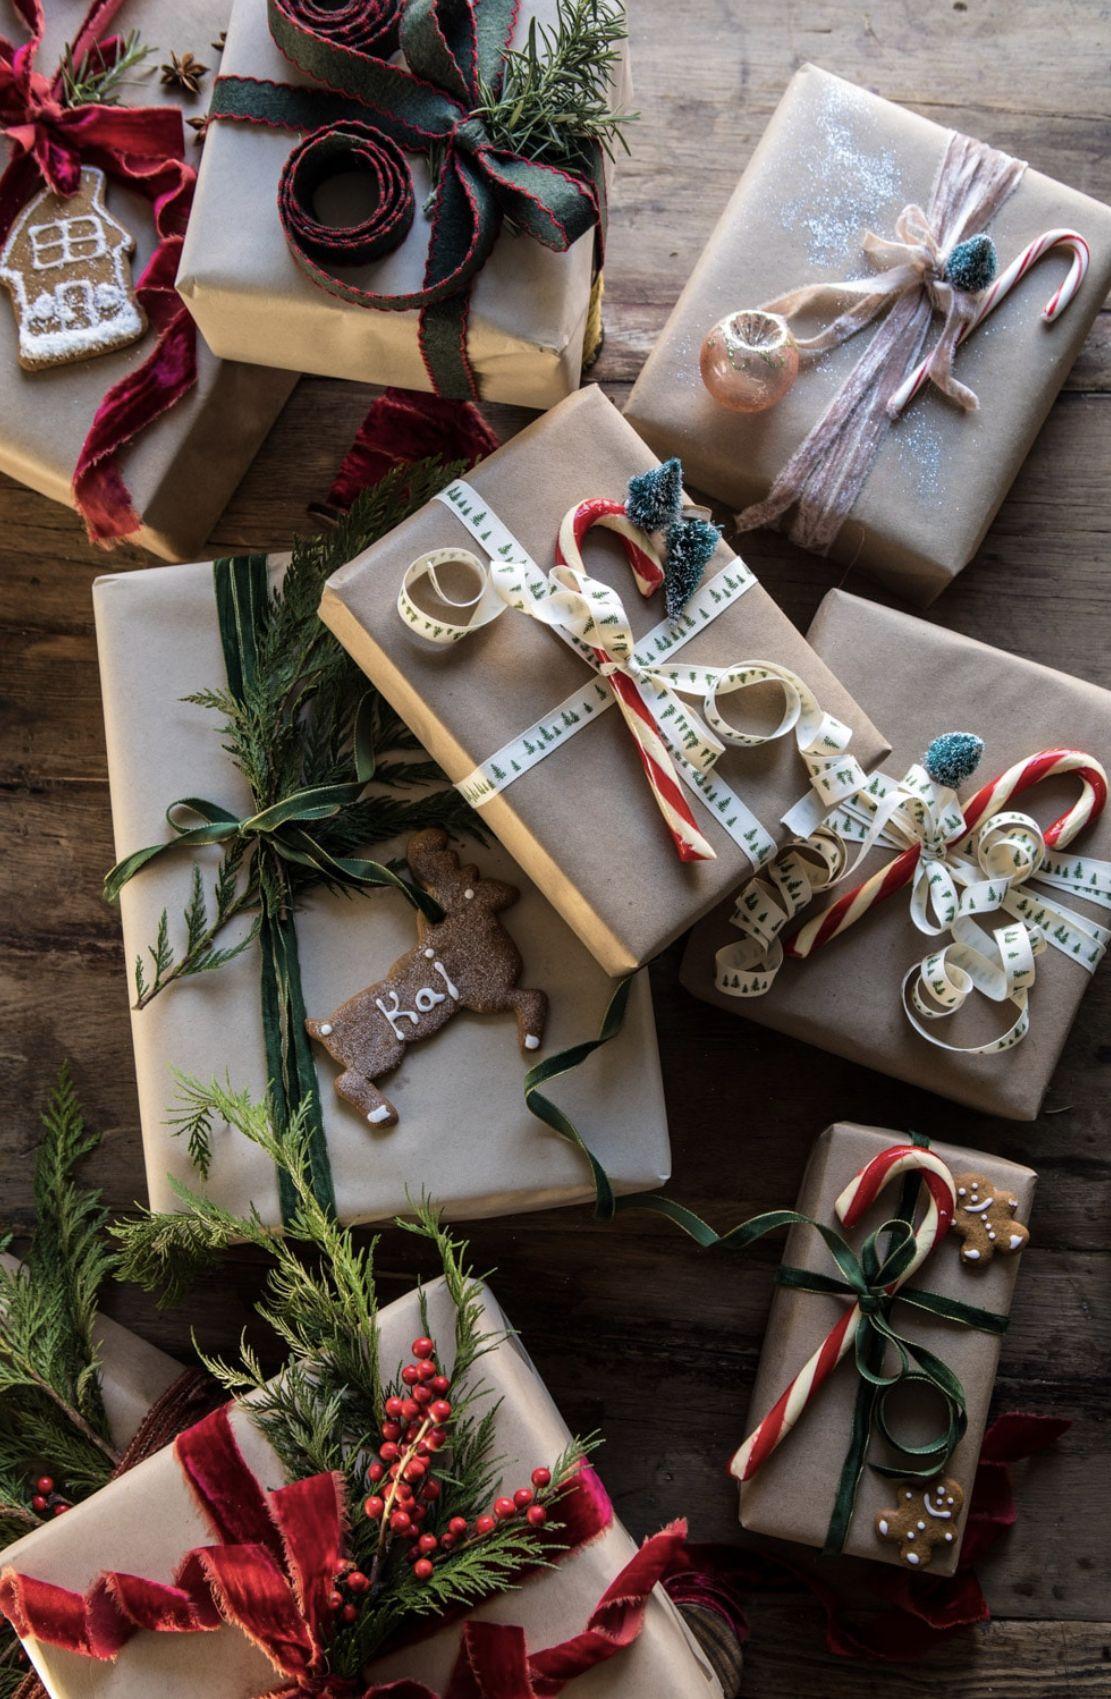 Pin by yas ab on Merry Christmas   Christmas wrapping diy ...